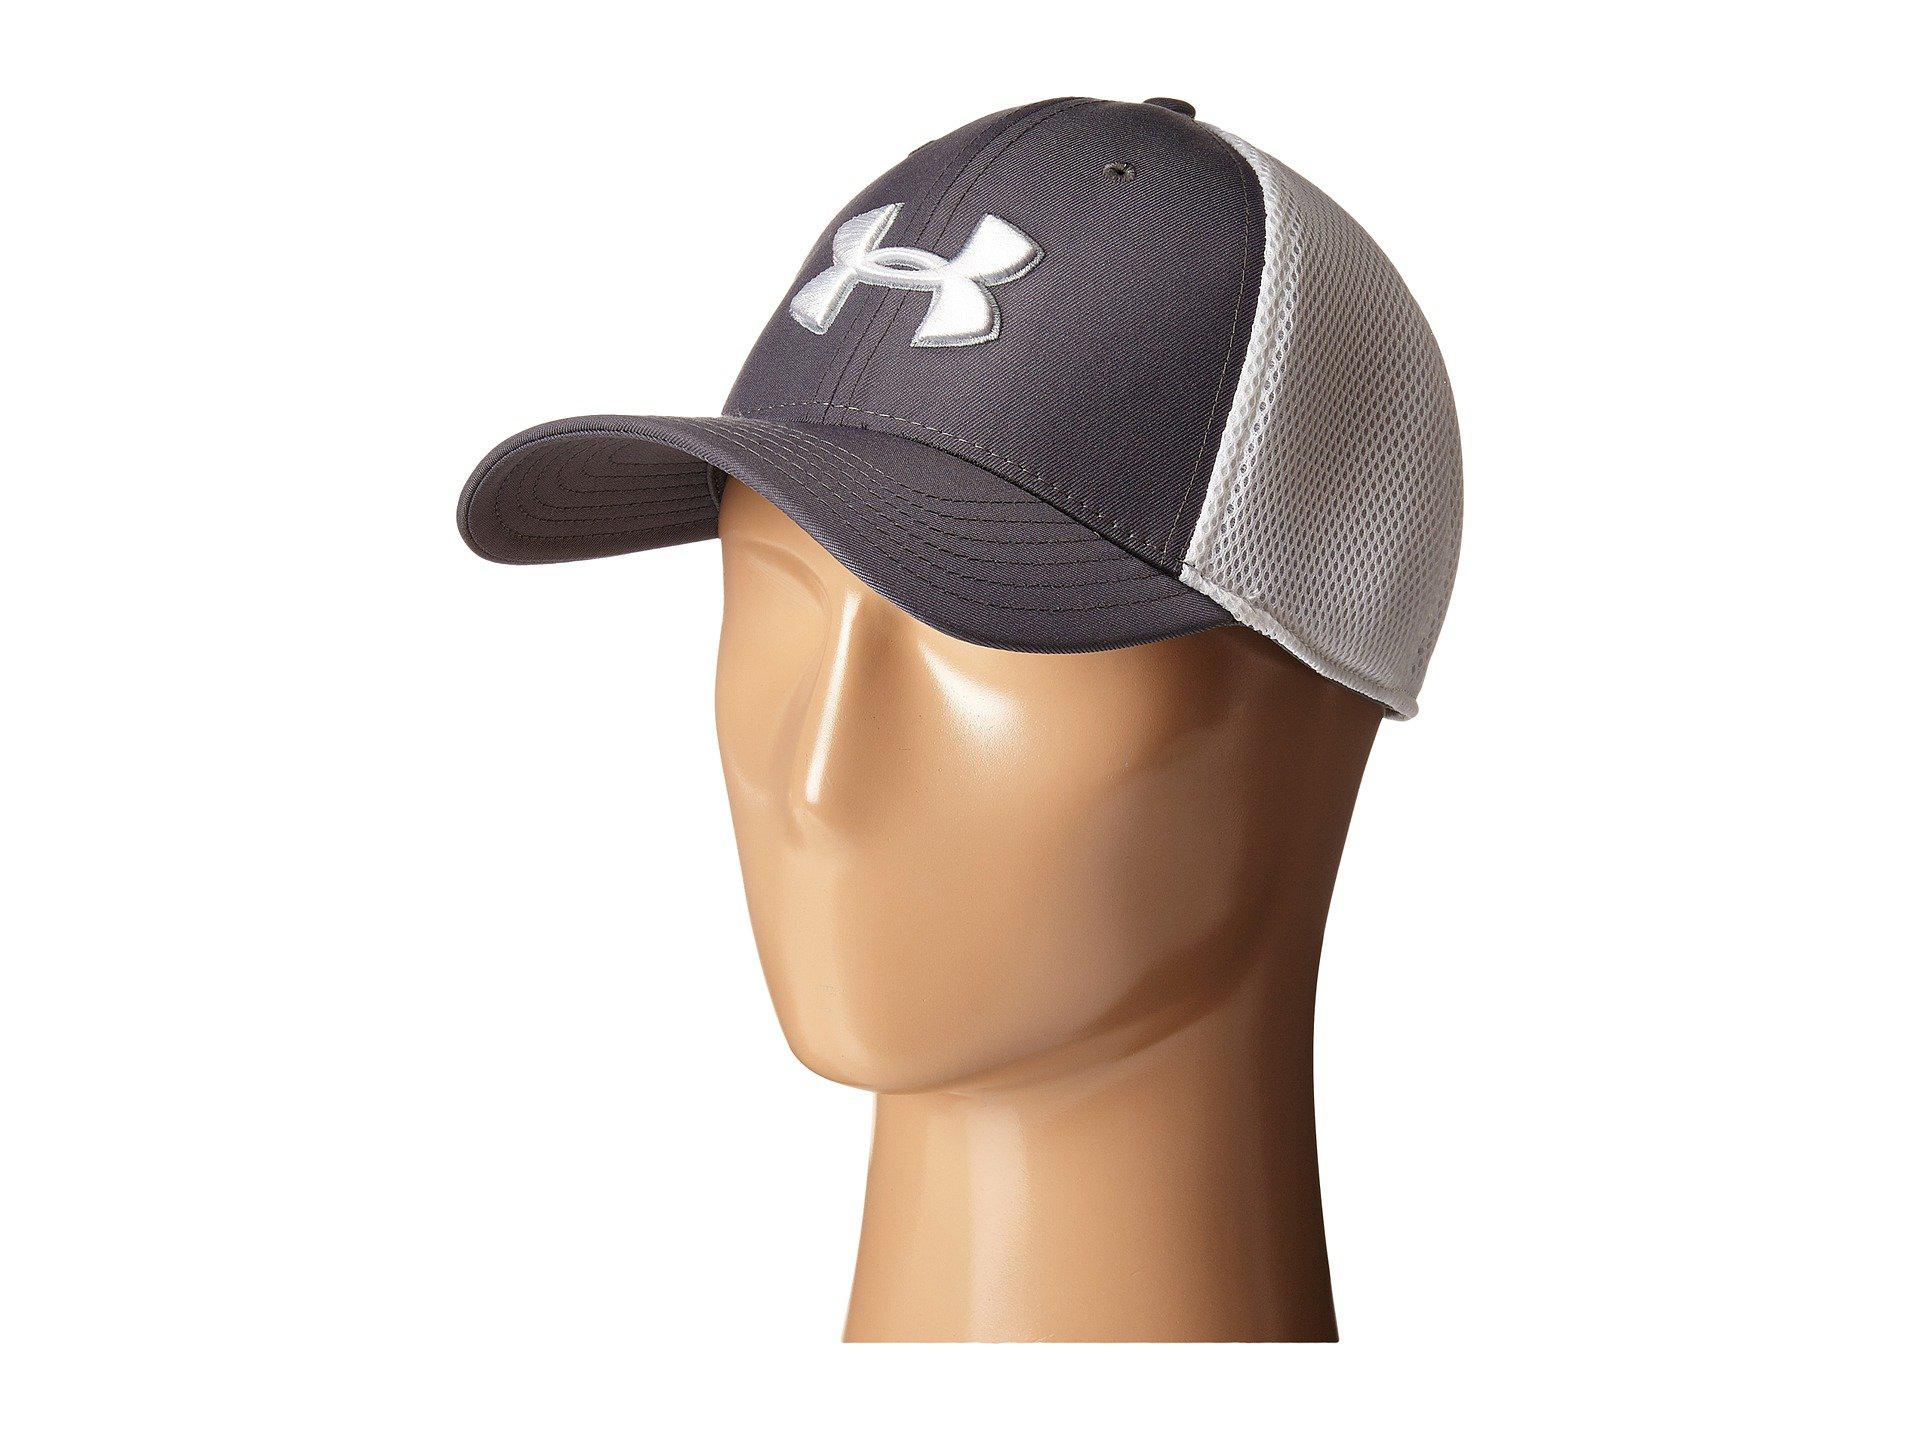 dd968318761 Lyst - Under Armour Ua Golf Mesh Stretch 2.0 Cap in Gray for Men